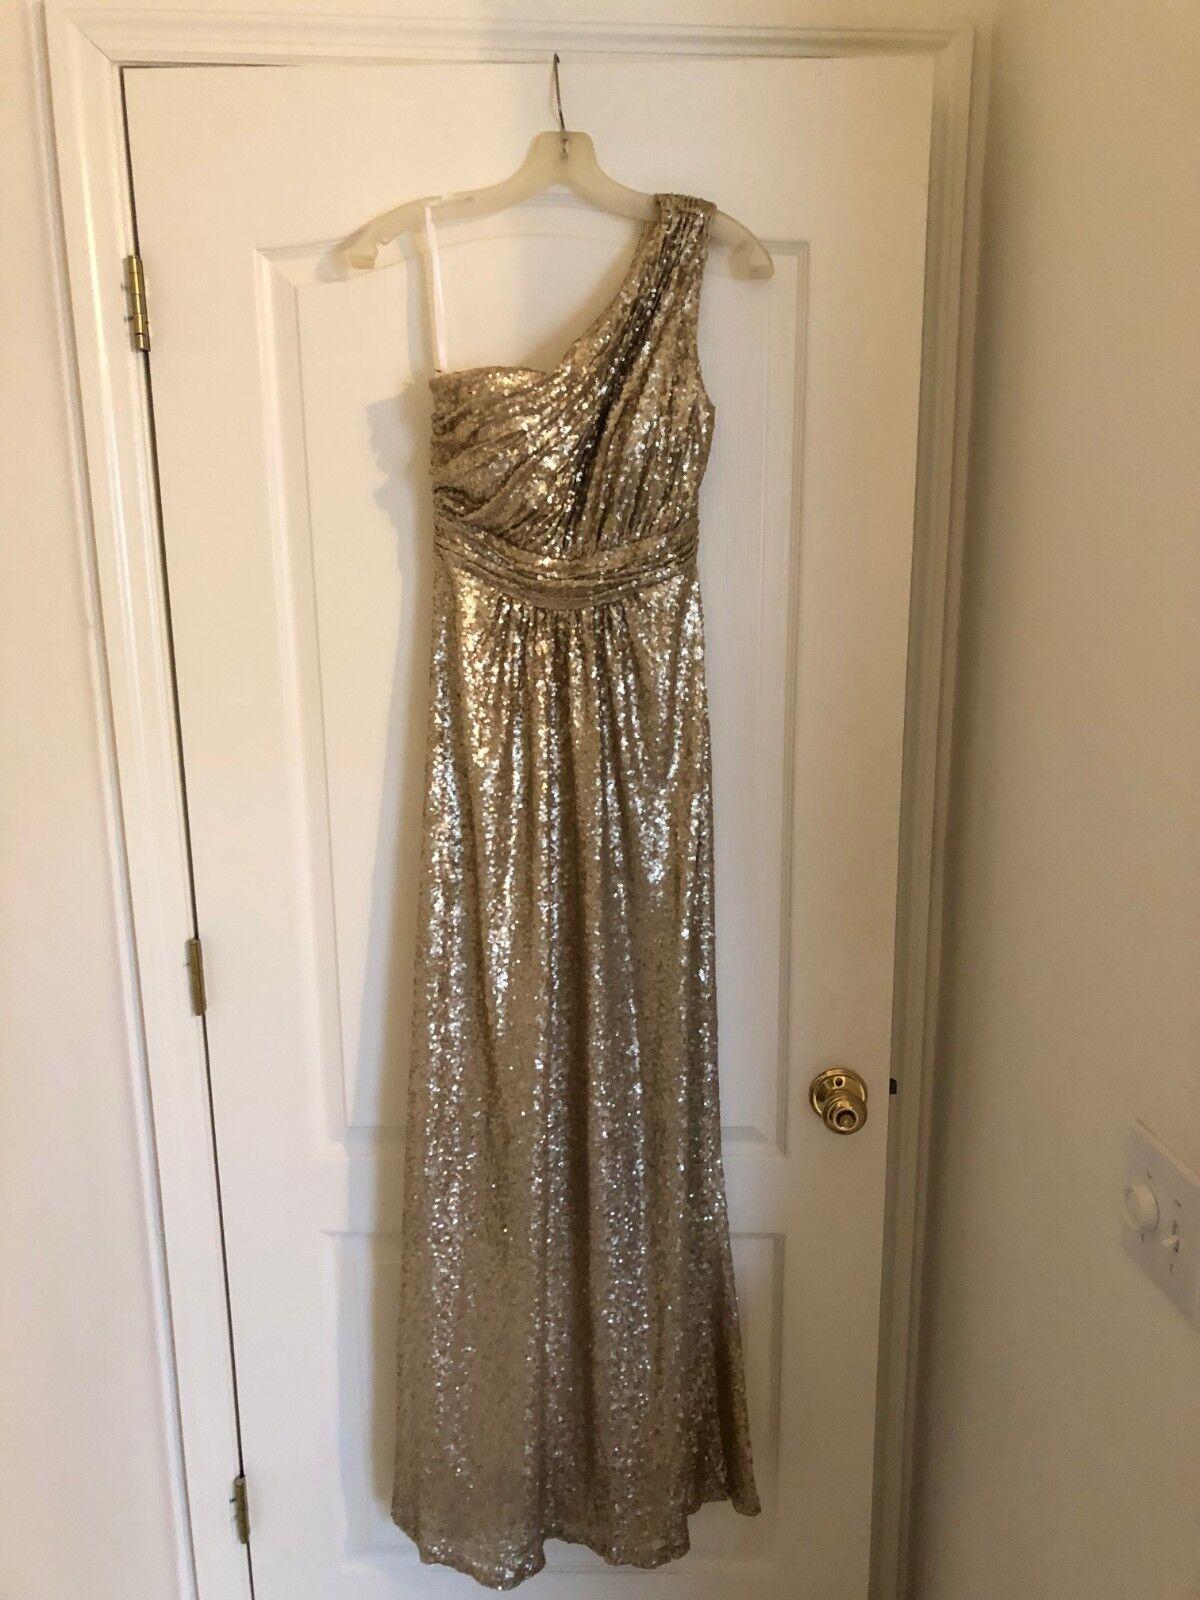 Revelry Bridesmaid Dress- Starla Ivory gold Sequined Maxi Maxi Maxi Dress, Size 4 Regular f3baa0